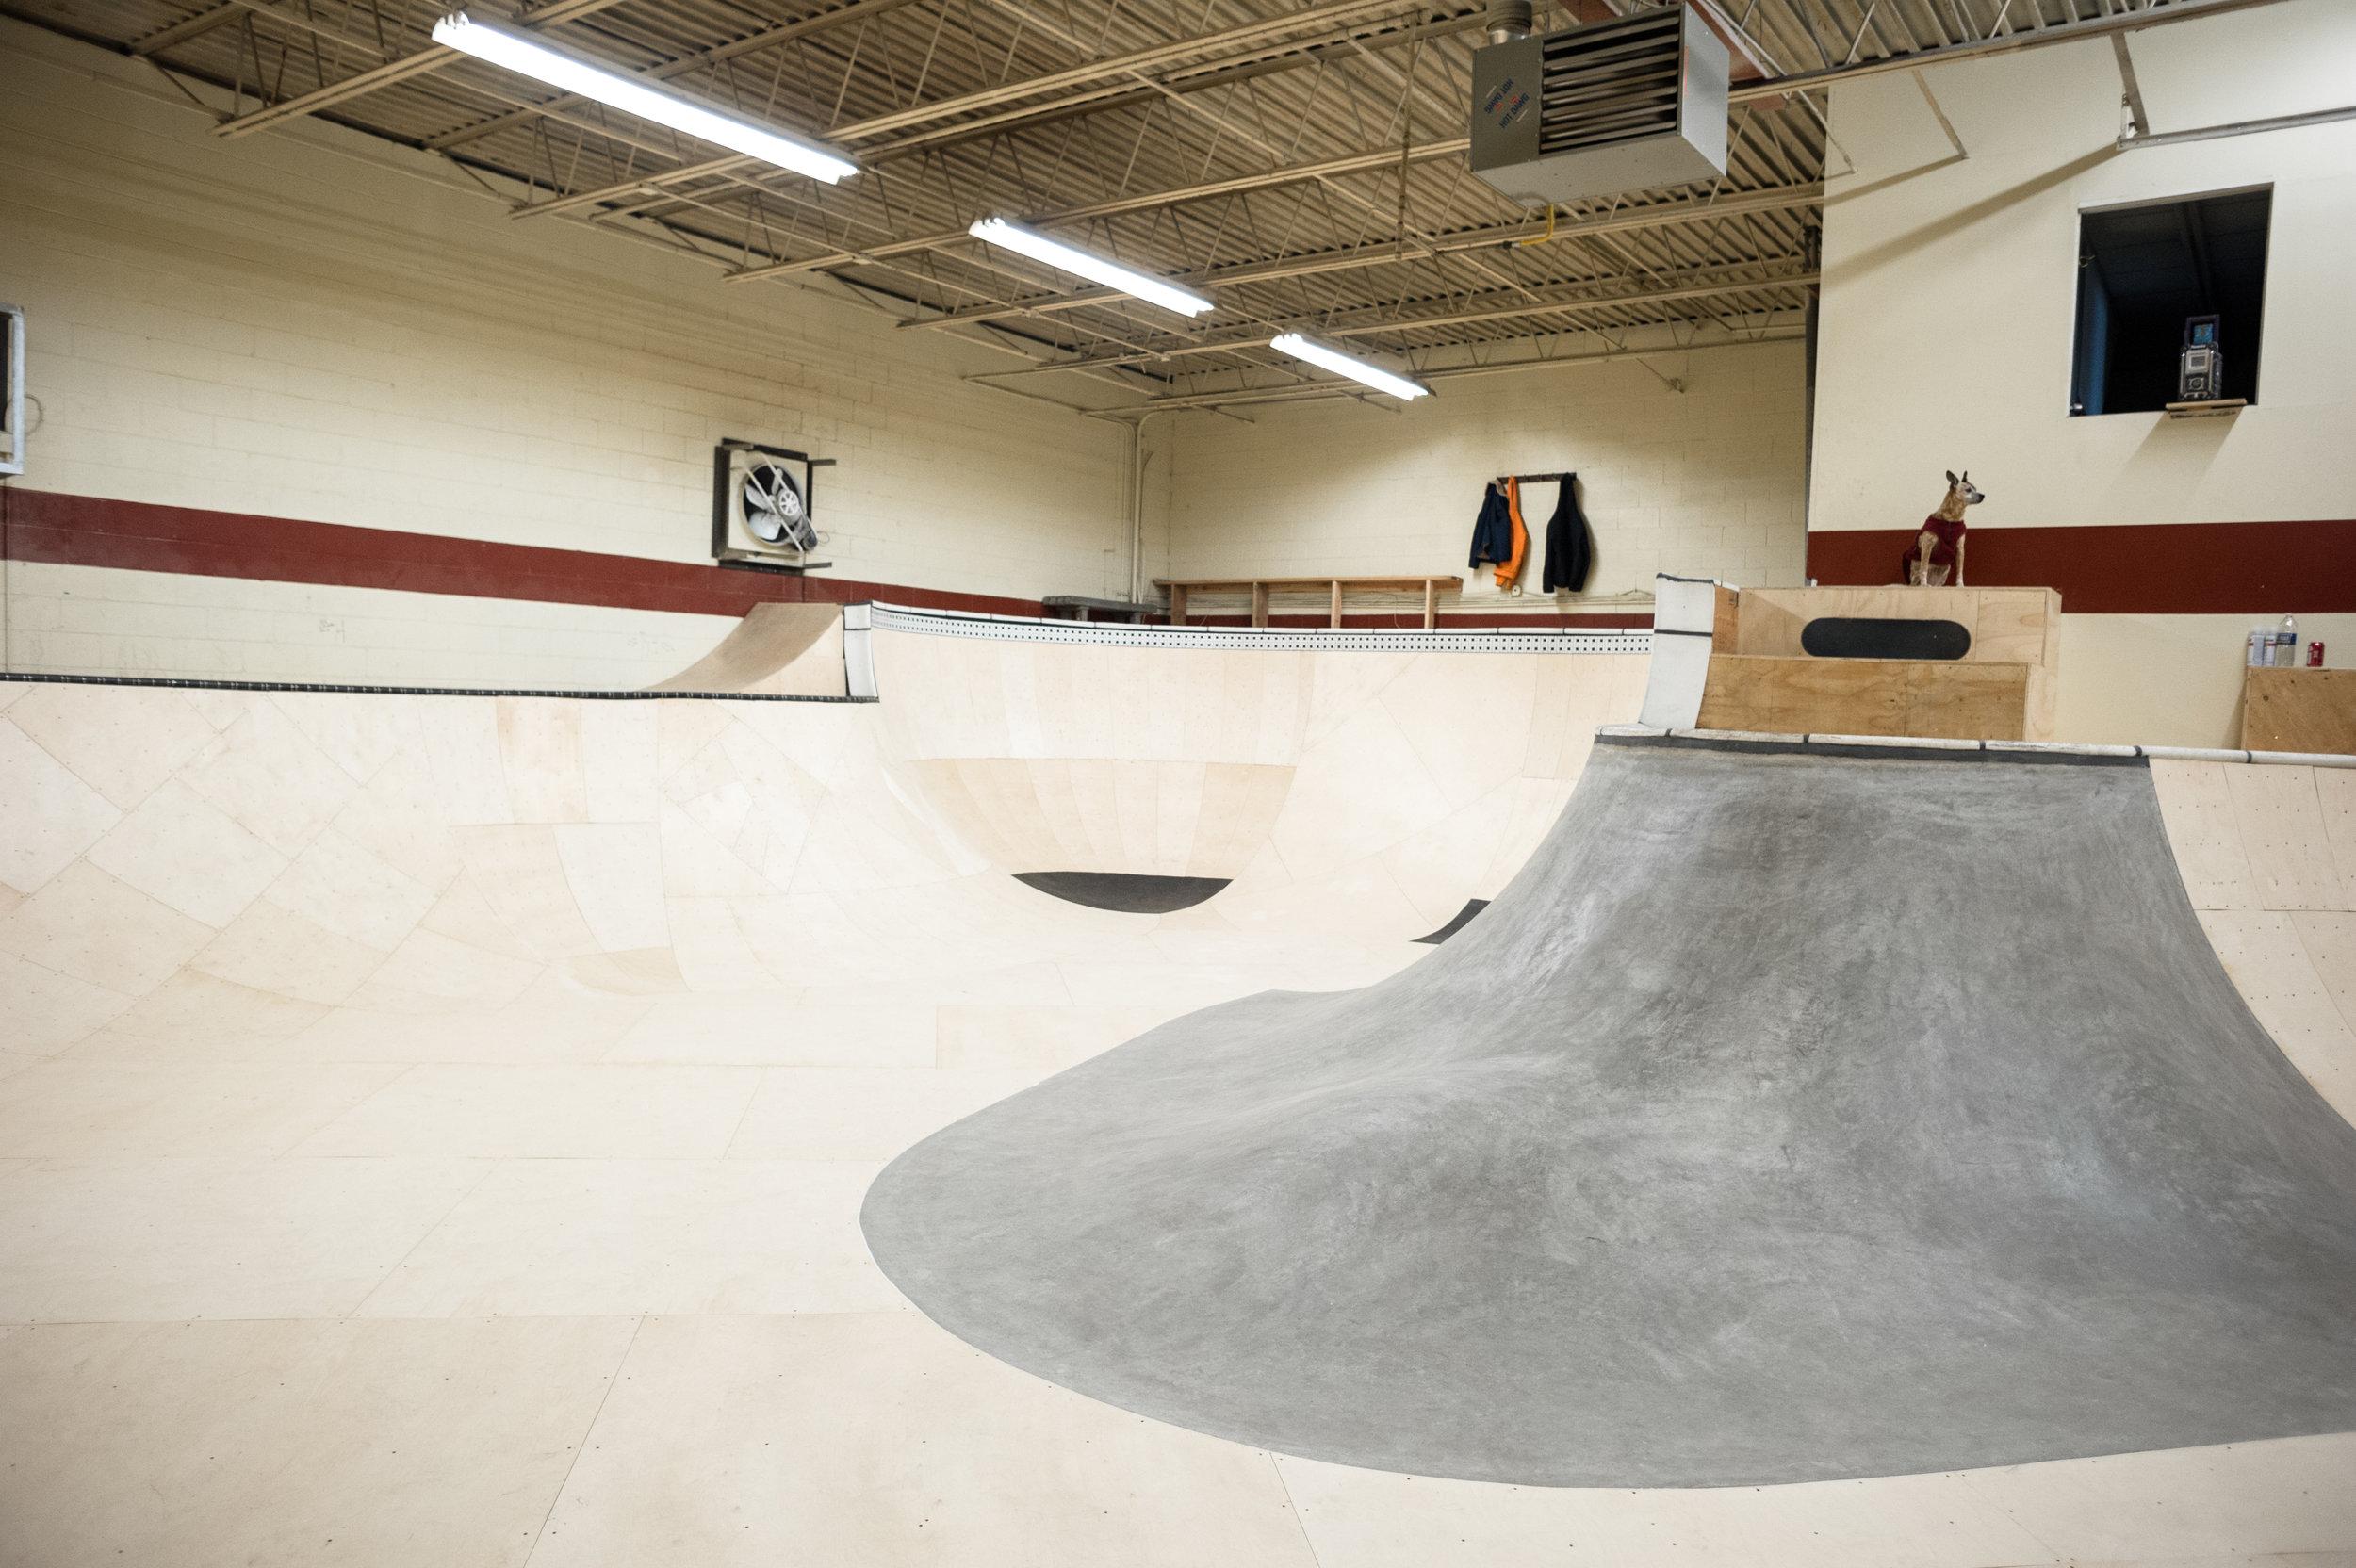 wharton St. Warehouse -